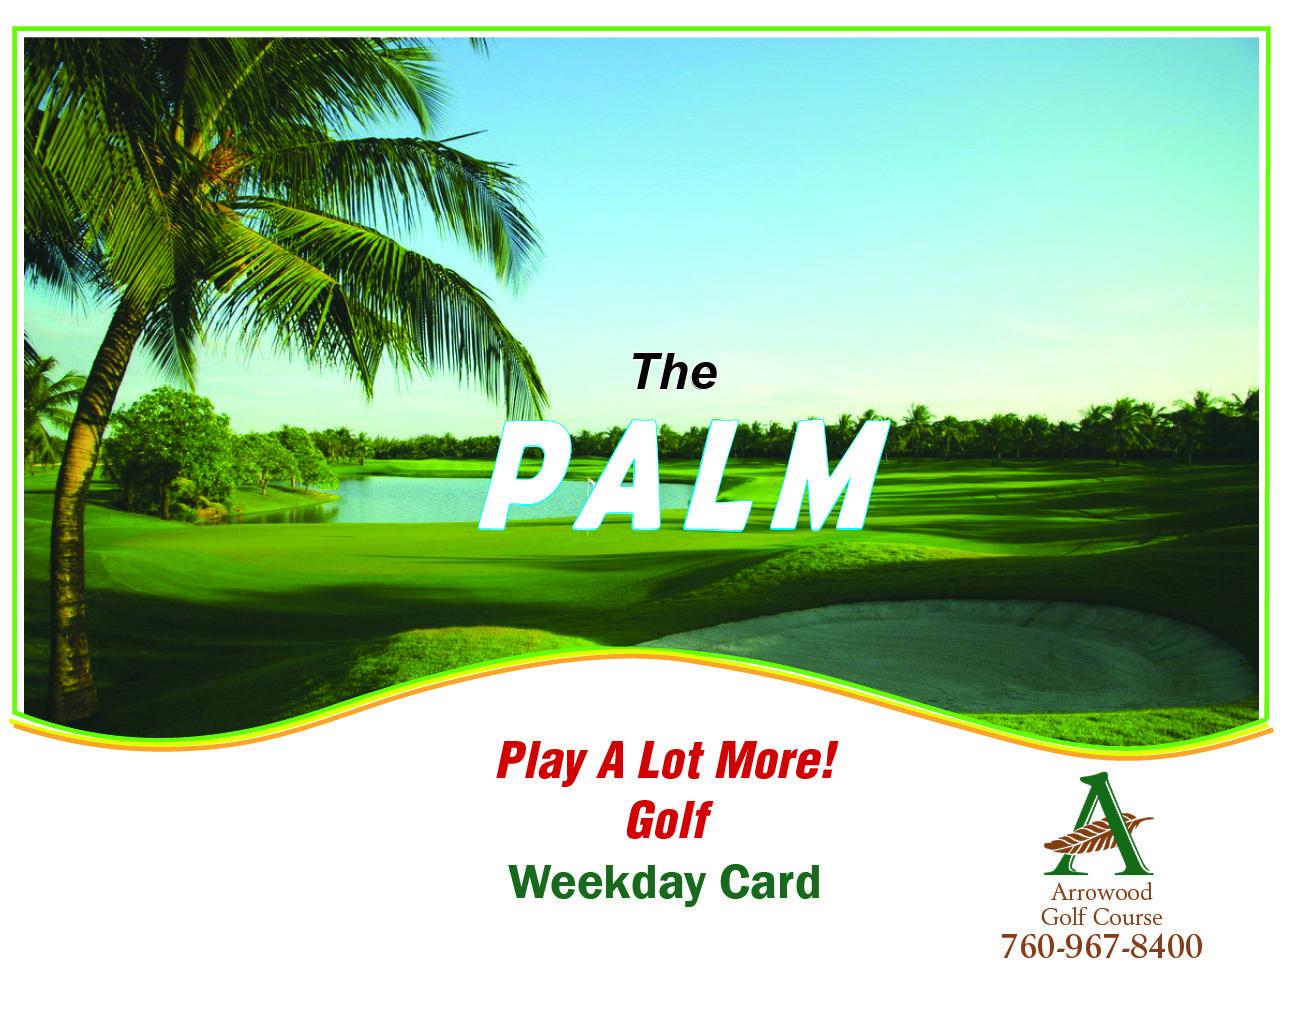 PALM Weekday Card / Coupon book